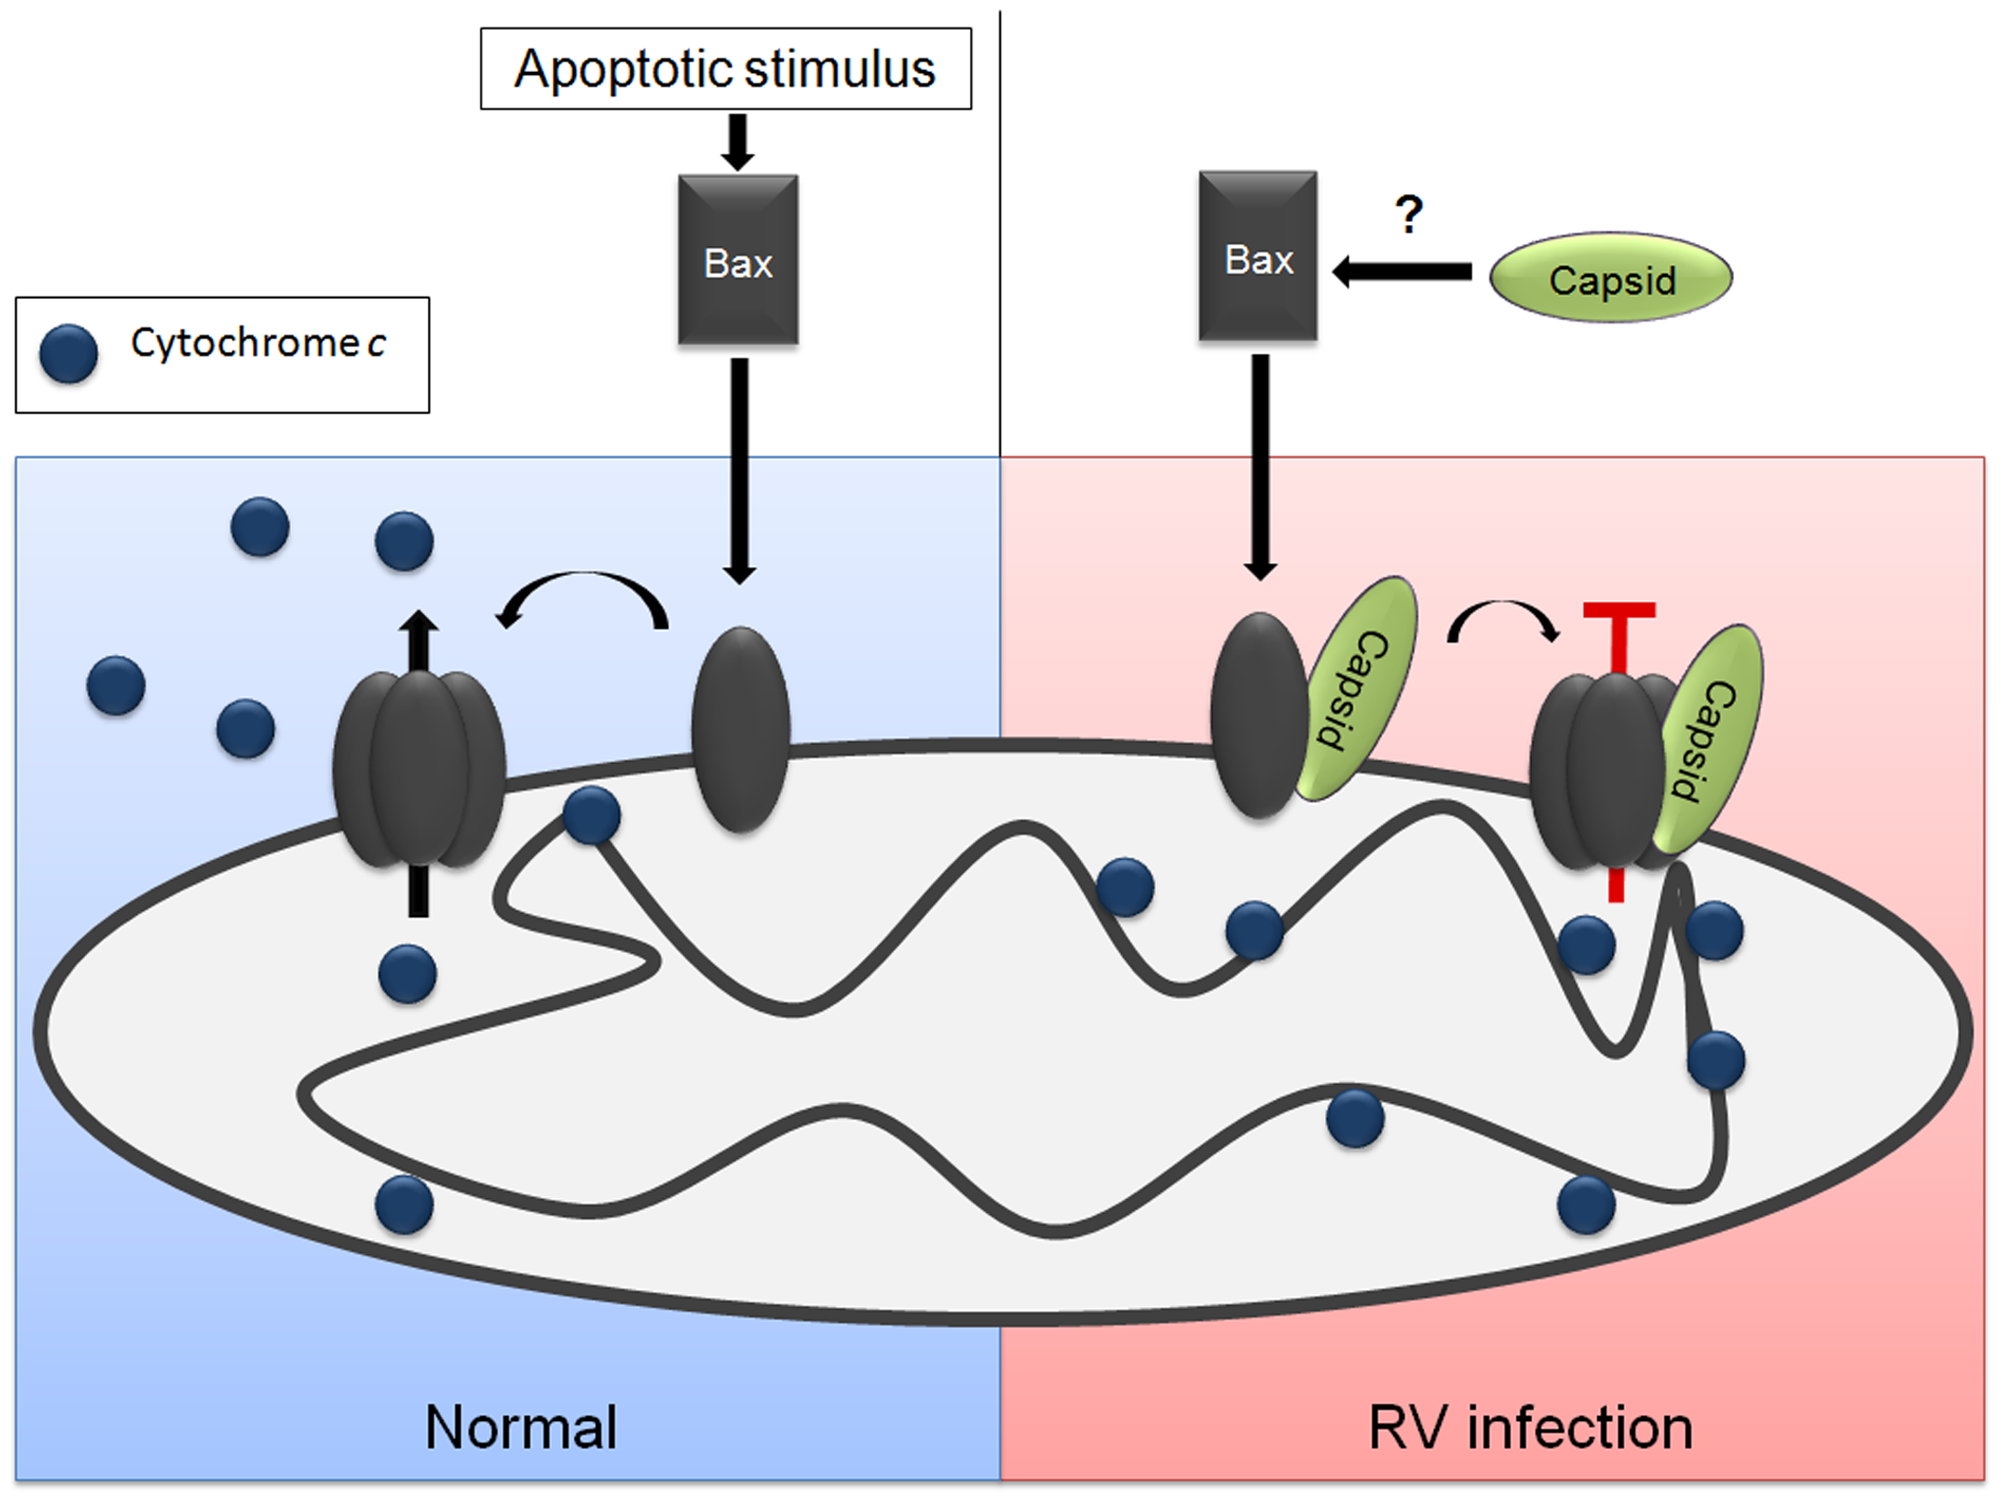 Model for how capsid blocks Bax-dependent apoptosis.